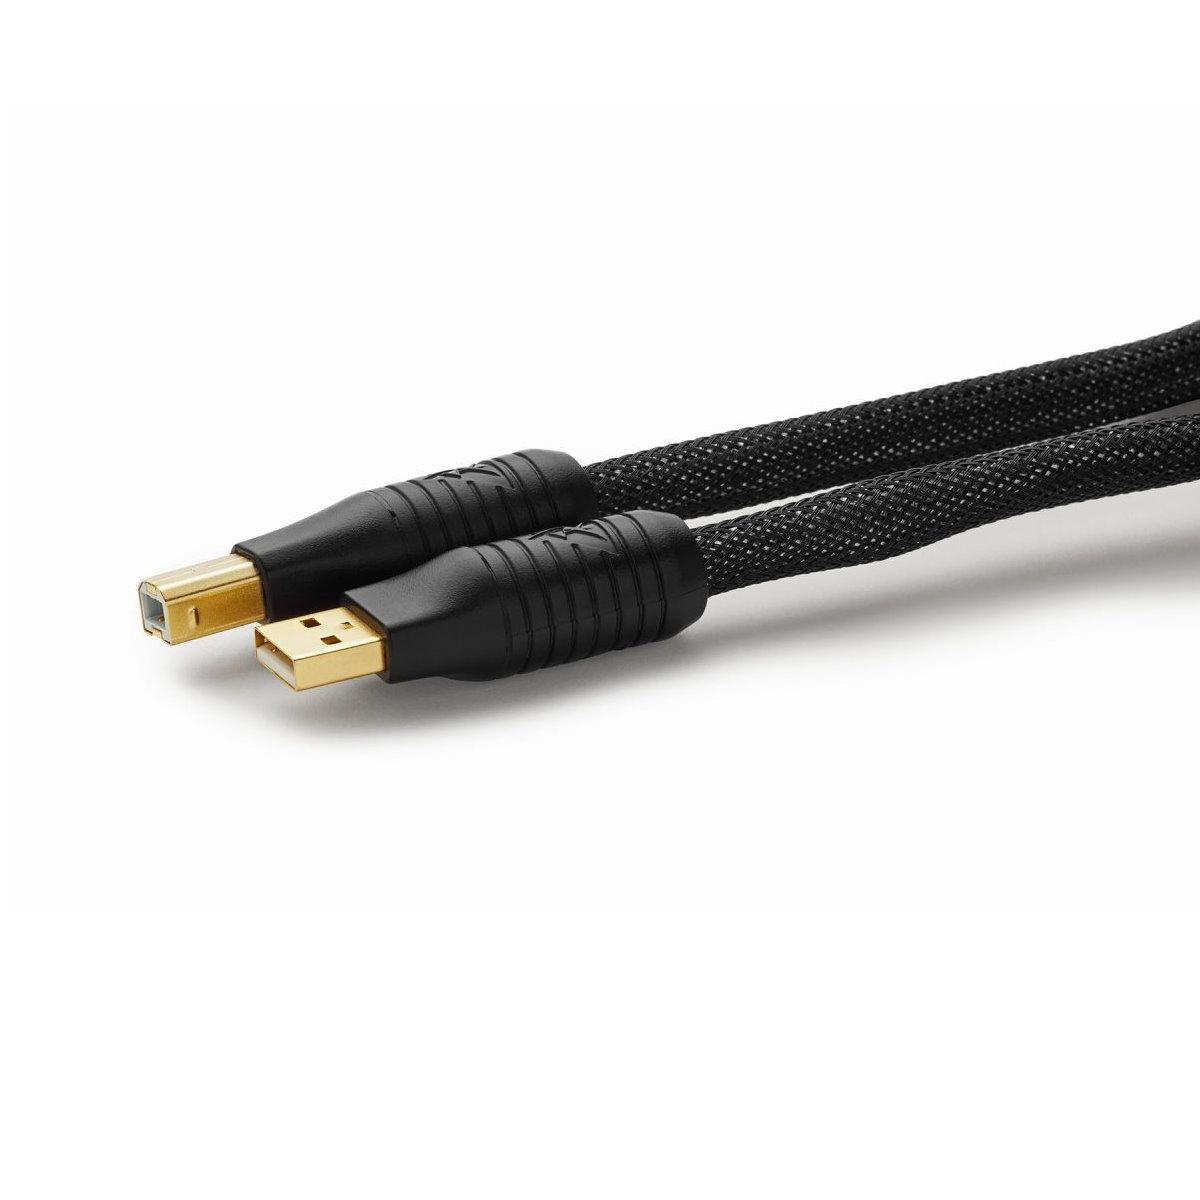 Shunyata Research Alpha Series USB Cable